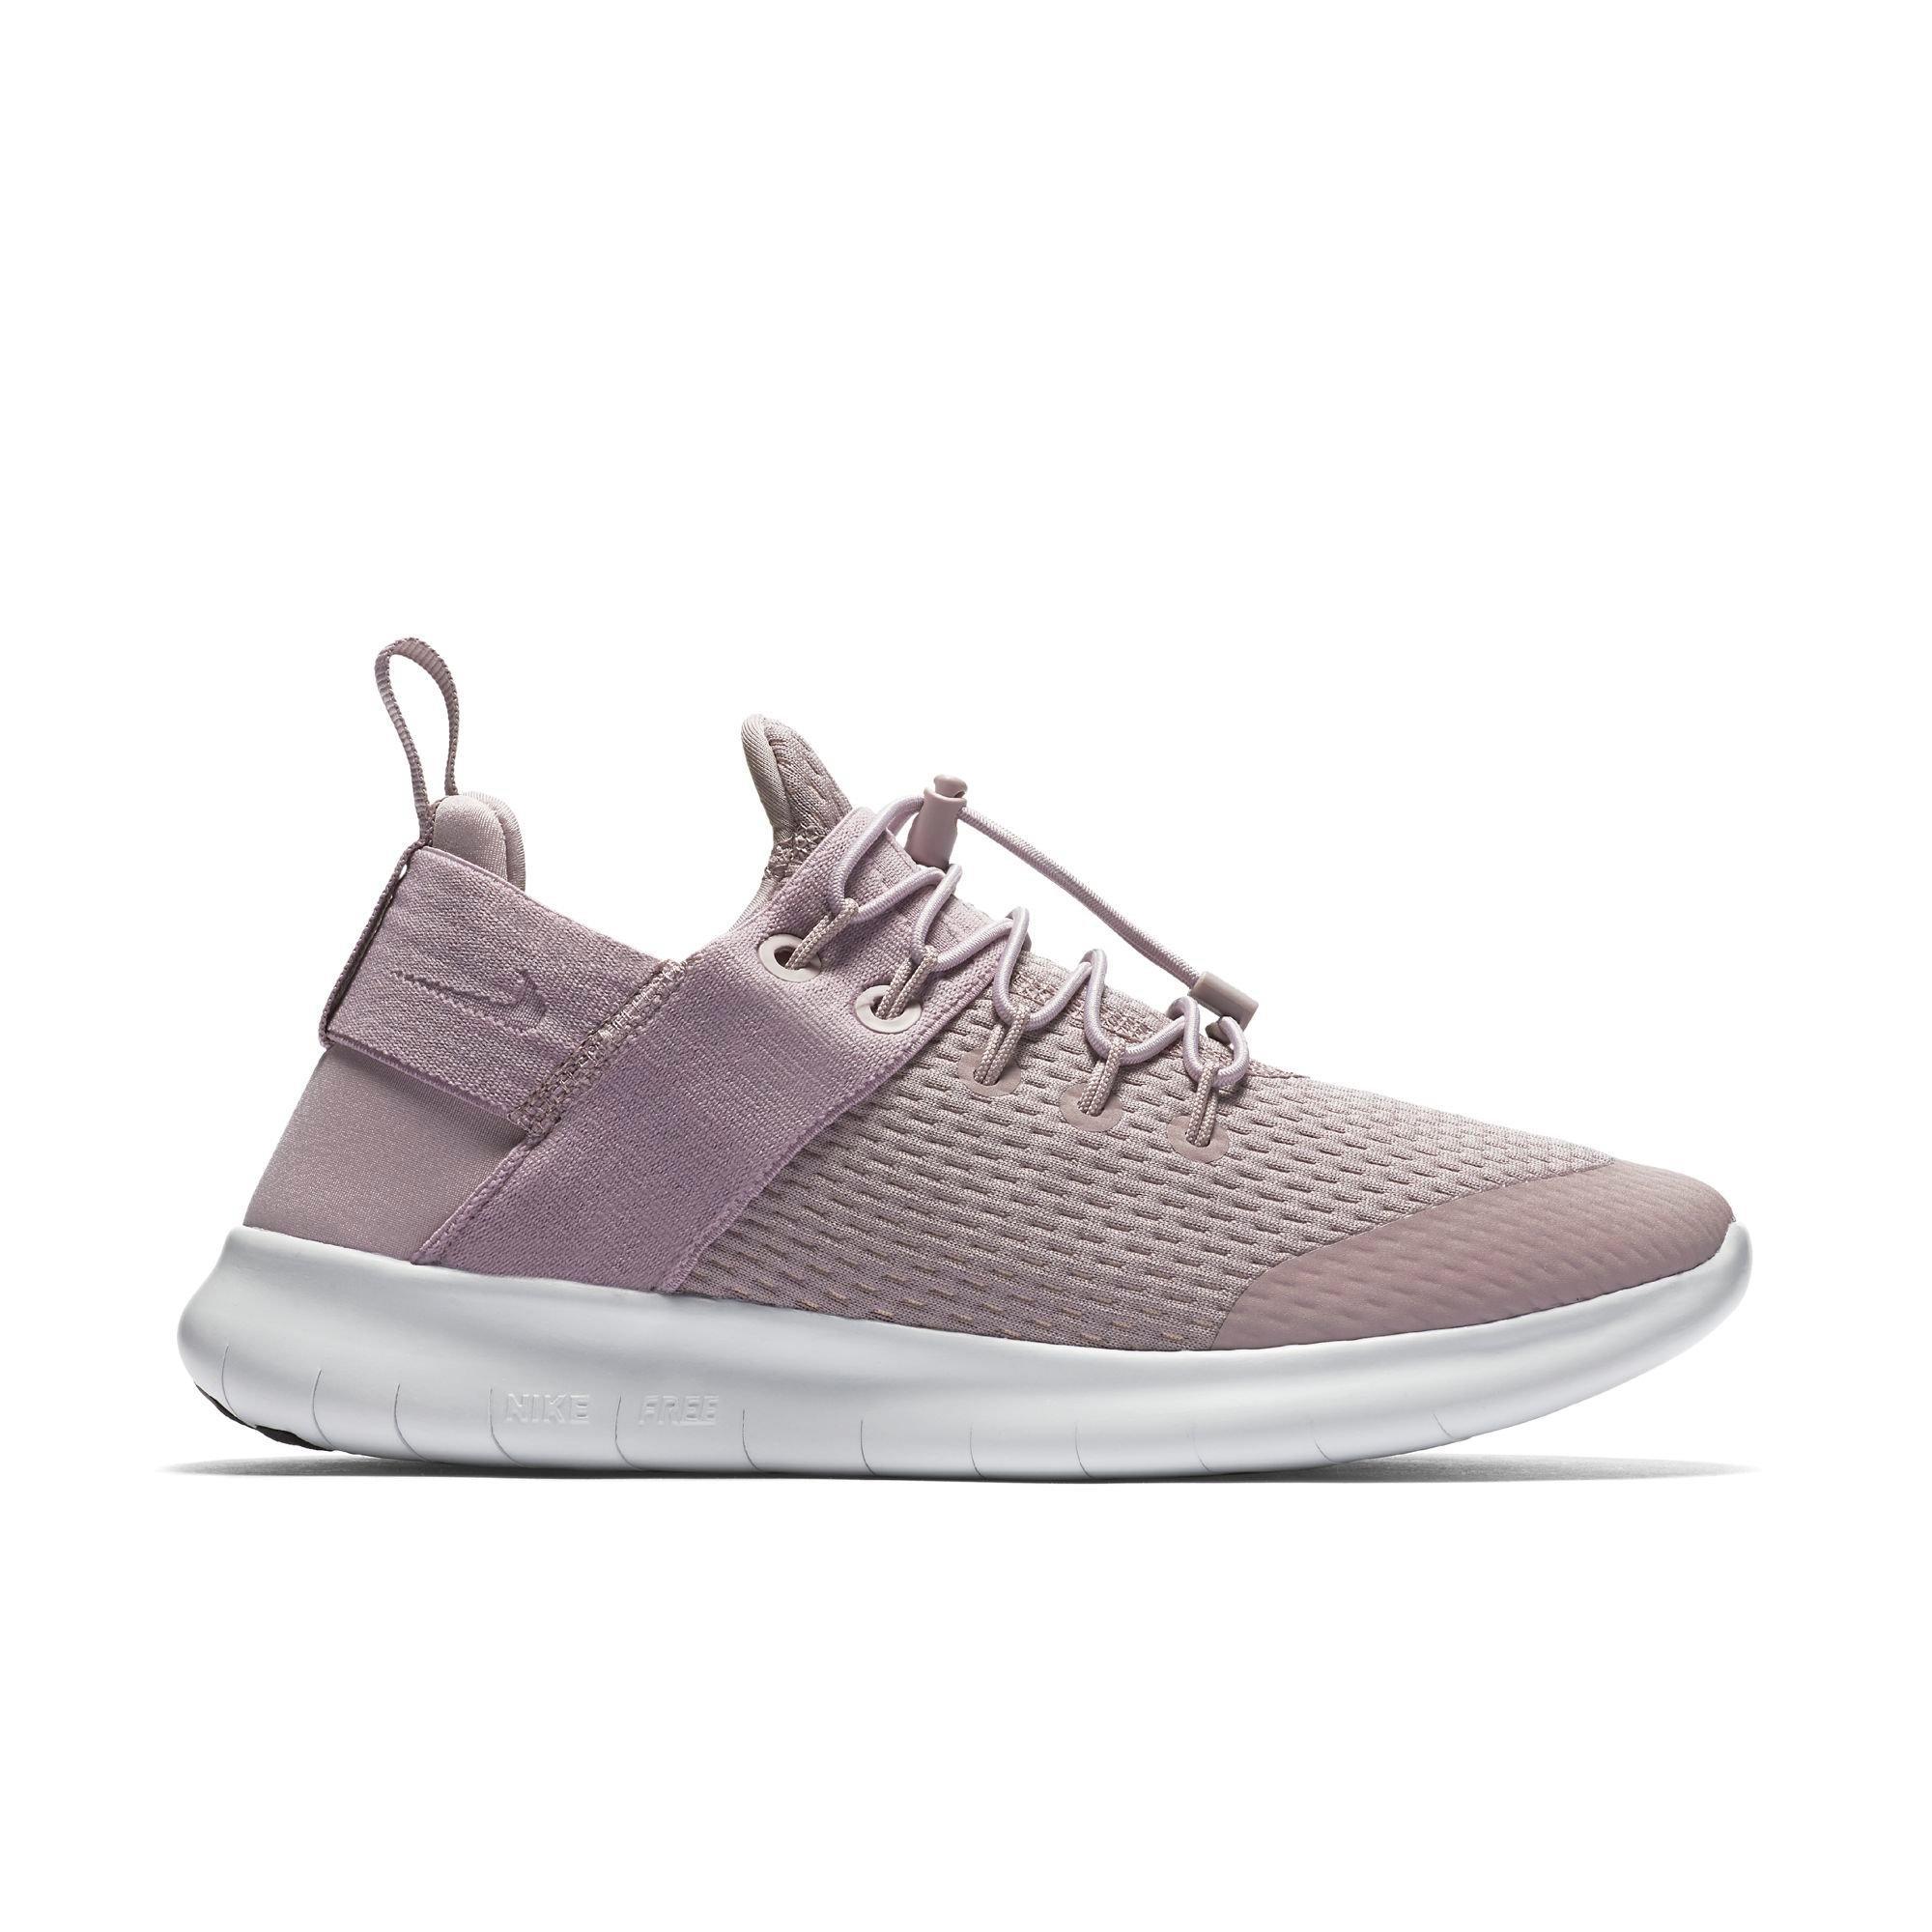 Misterioso Anormal pobreza  Nike Free RN Commuter RN Women's Running Shoe - Hibbett | City Gear